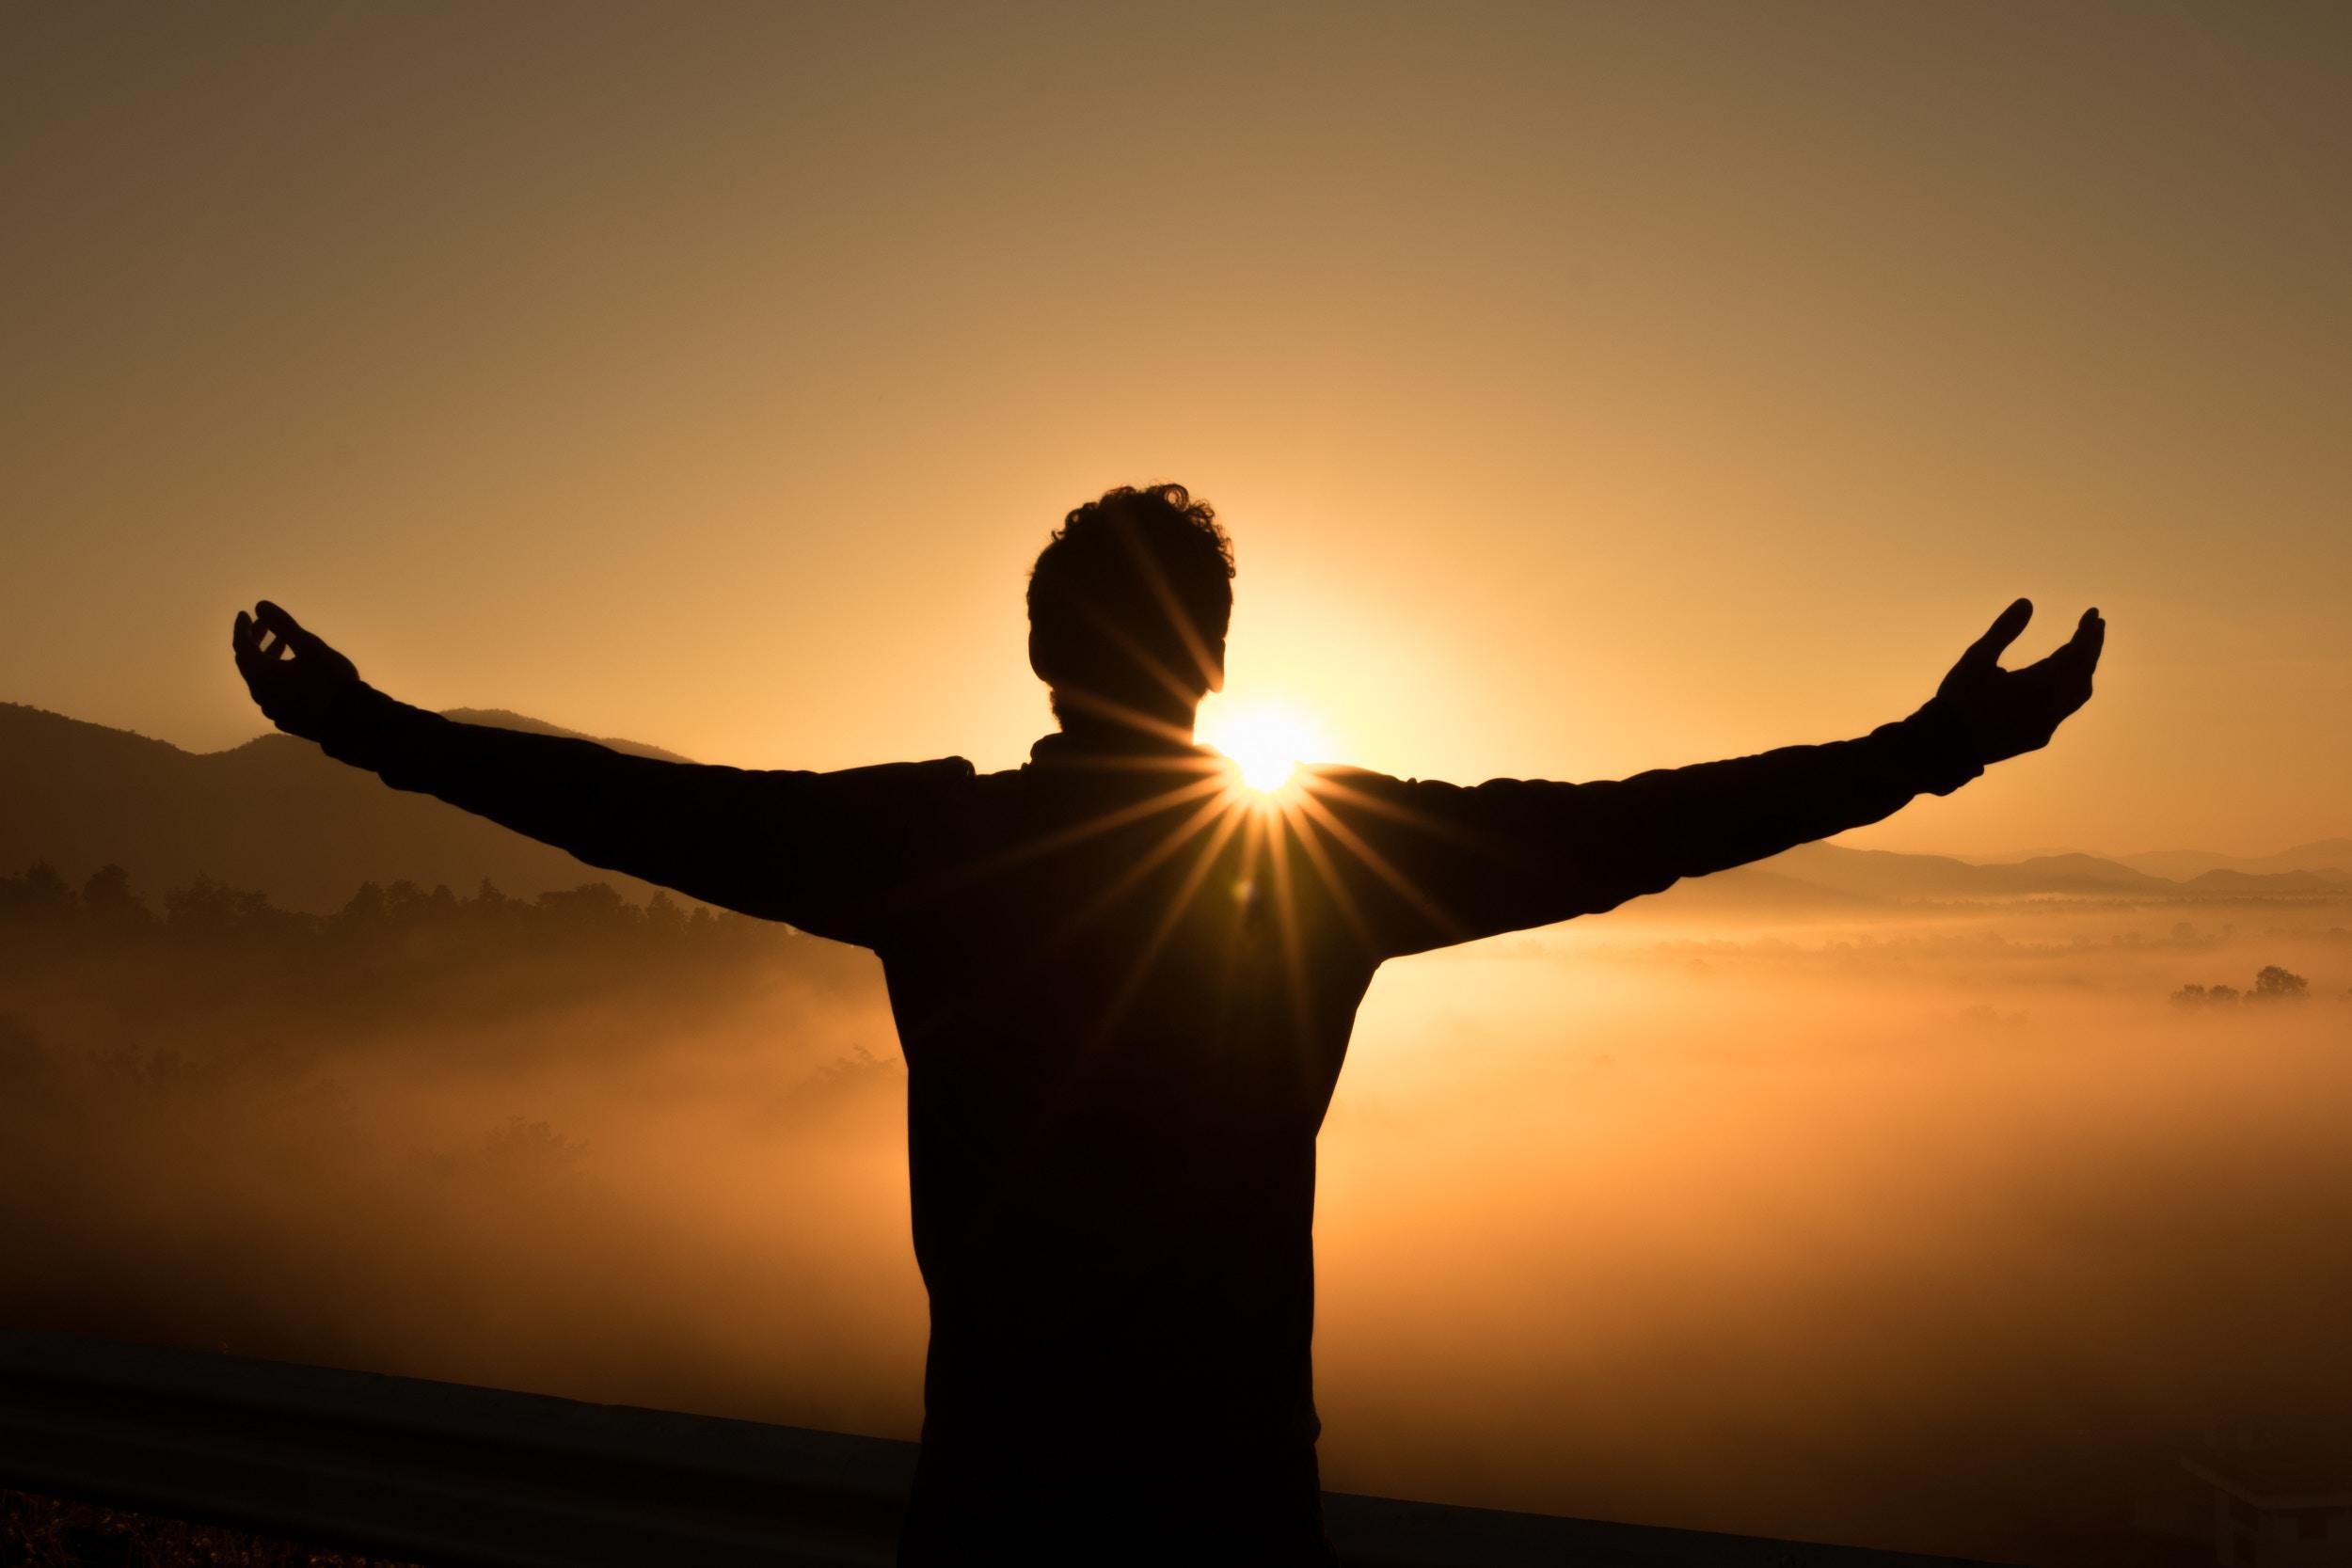 changes by prayer